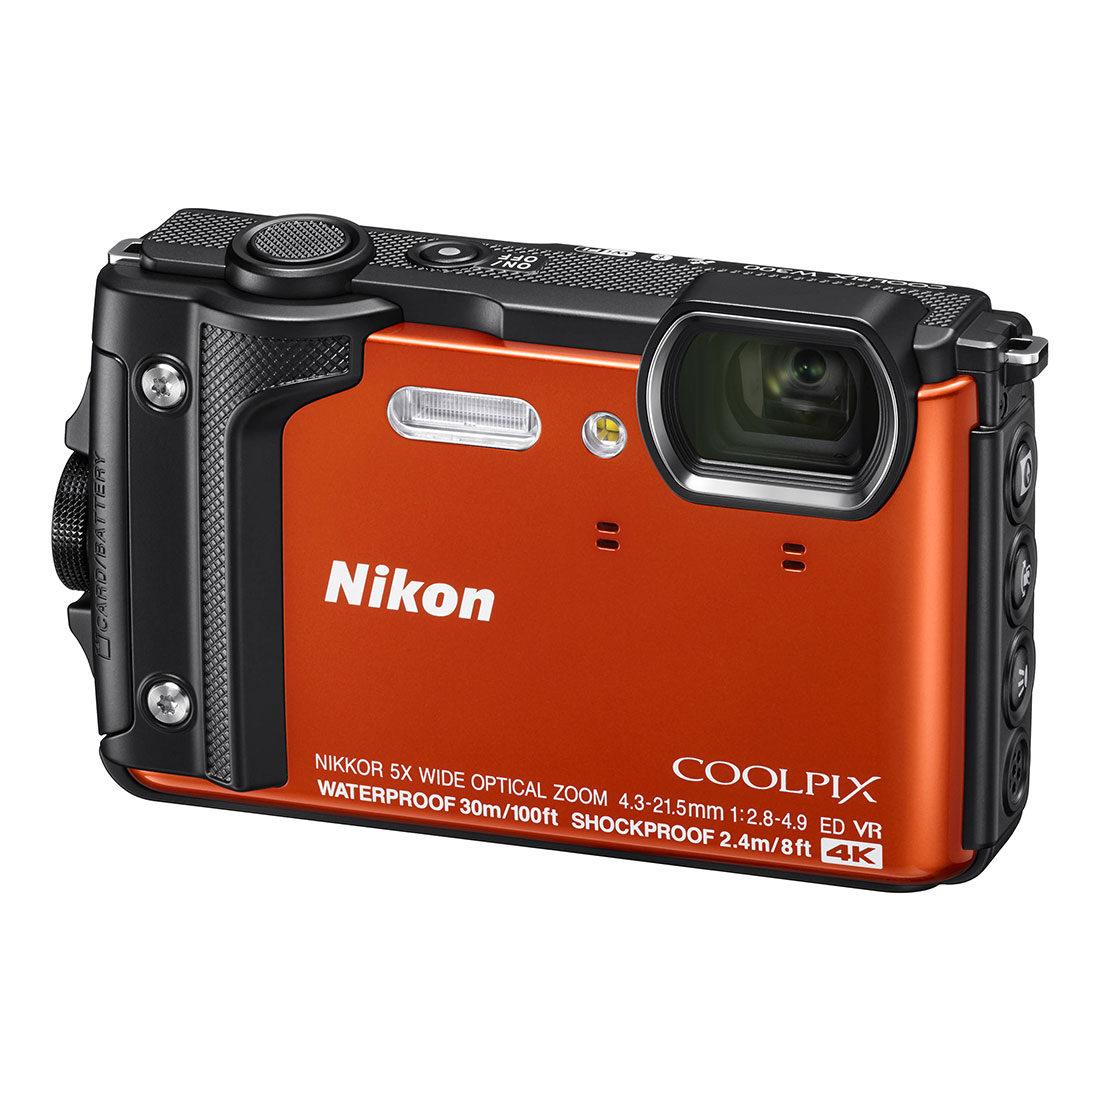 Nikon Coolpix W300 compact camera Oranje <br/>€ 399.00 <br/> <a href='https://www.cameranu.nl/fotografie/?tt=12190_474631_241358_&r=https%3A%2F%2Fwww.cameranu.nl%2Fnl%2Fp1854355%2Fnikon-coolpix-w300-compact-camera-oranje%3Fchannable%3De10841.MTg1NDM1NQ%26utm_campaign%3D%26utm_content%3DCompact%2Bcamera%26utm_source%3DTradetracker%26utm_medium%3Dcpc%26utm_term%3DDigitale%2Bcamera%26apos%3Bs' target='_blank'>naar de winkel</a>